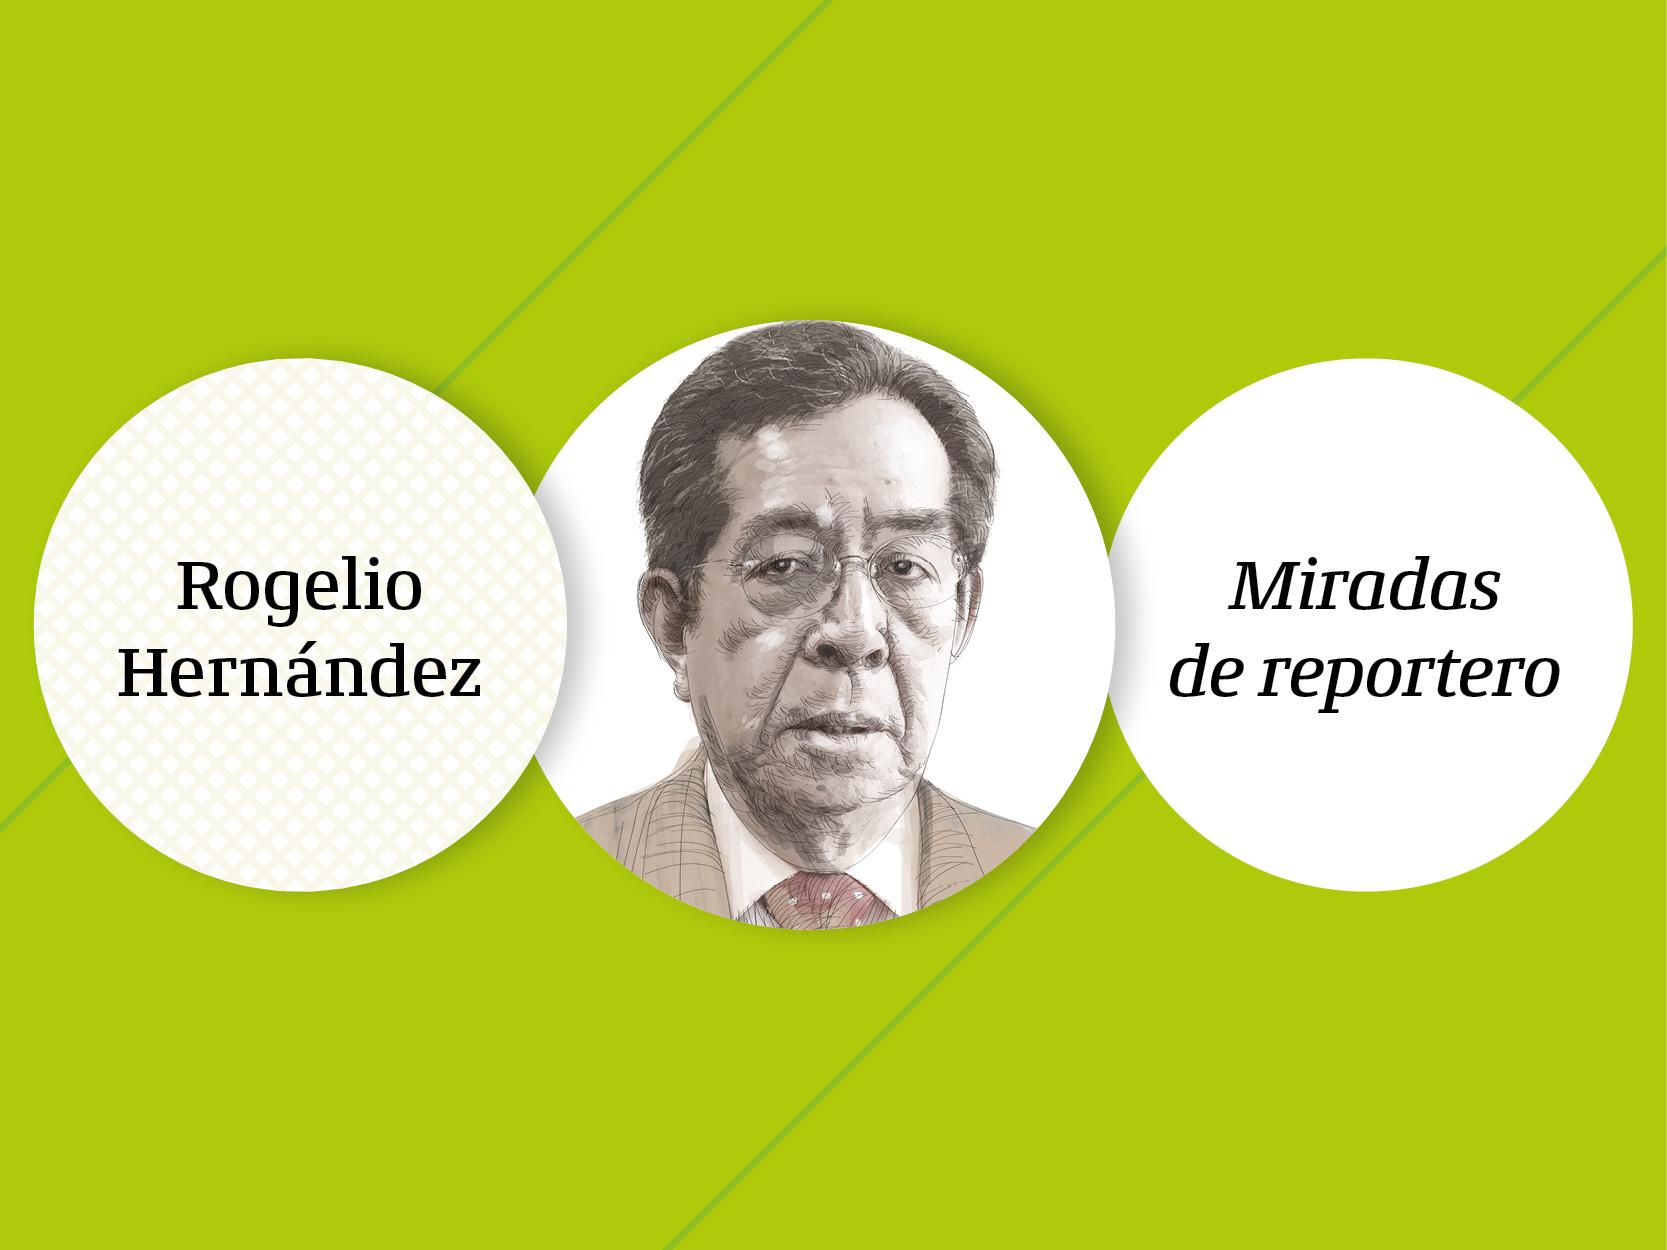 Científicas verifican que para ser periodista en México hay que joderse